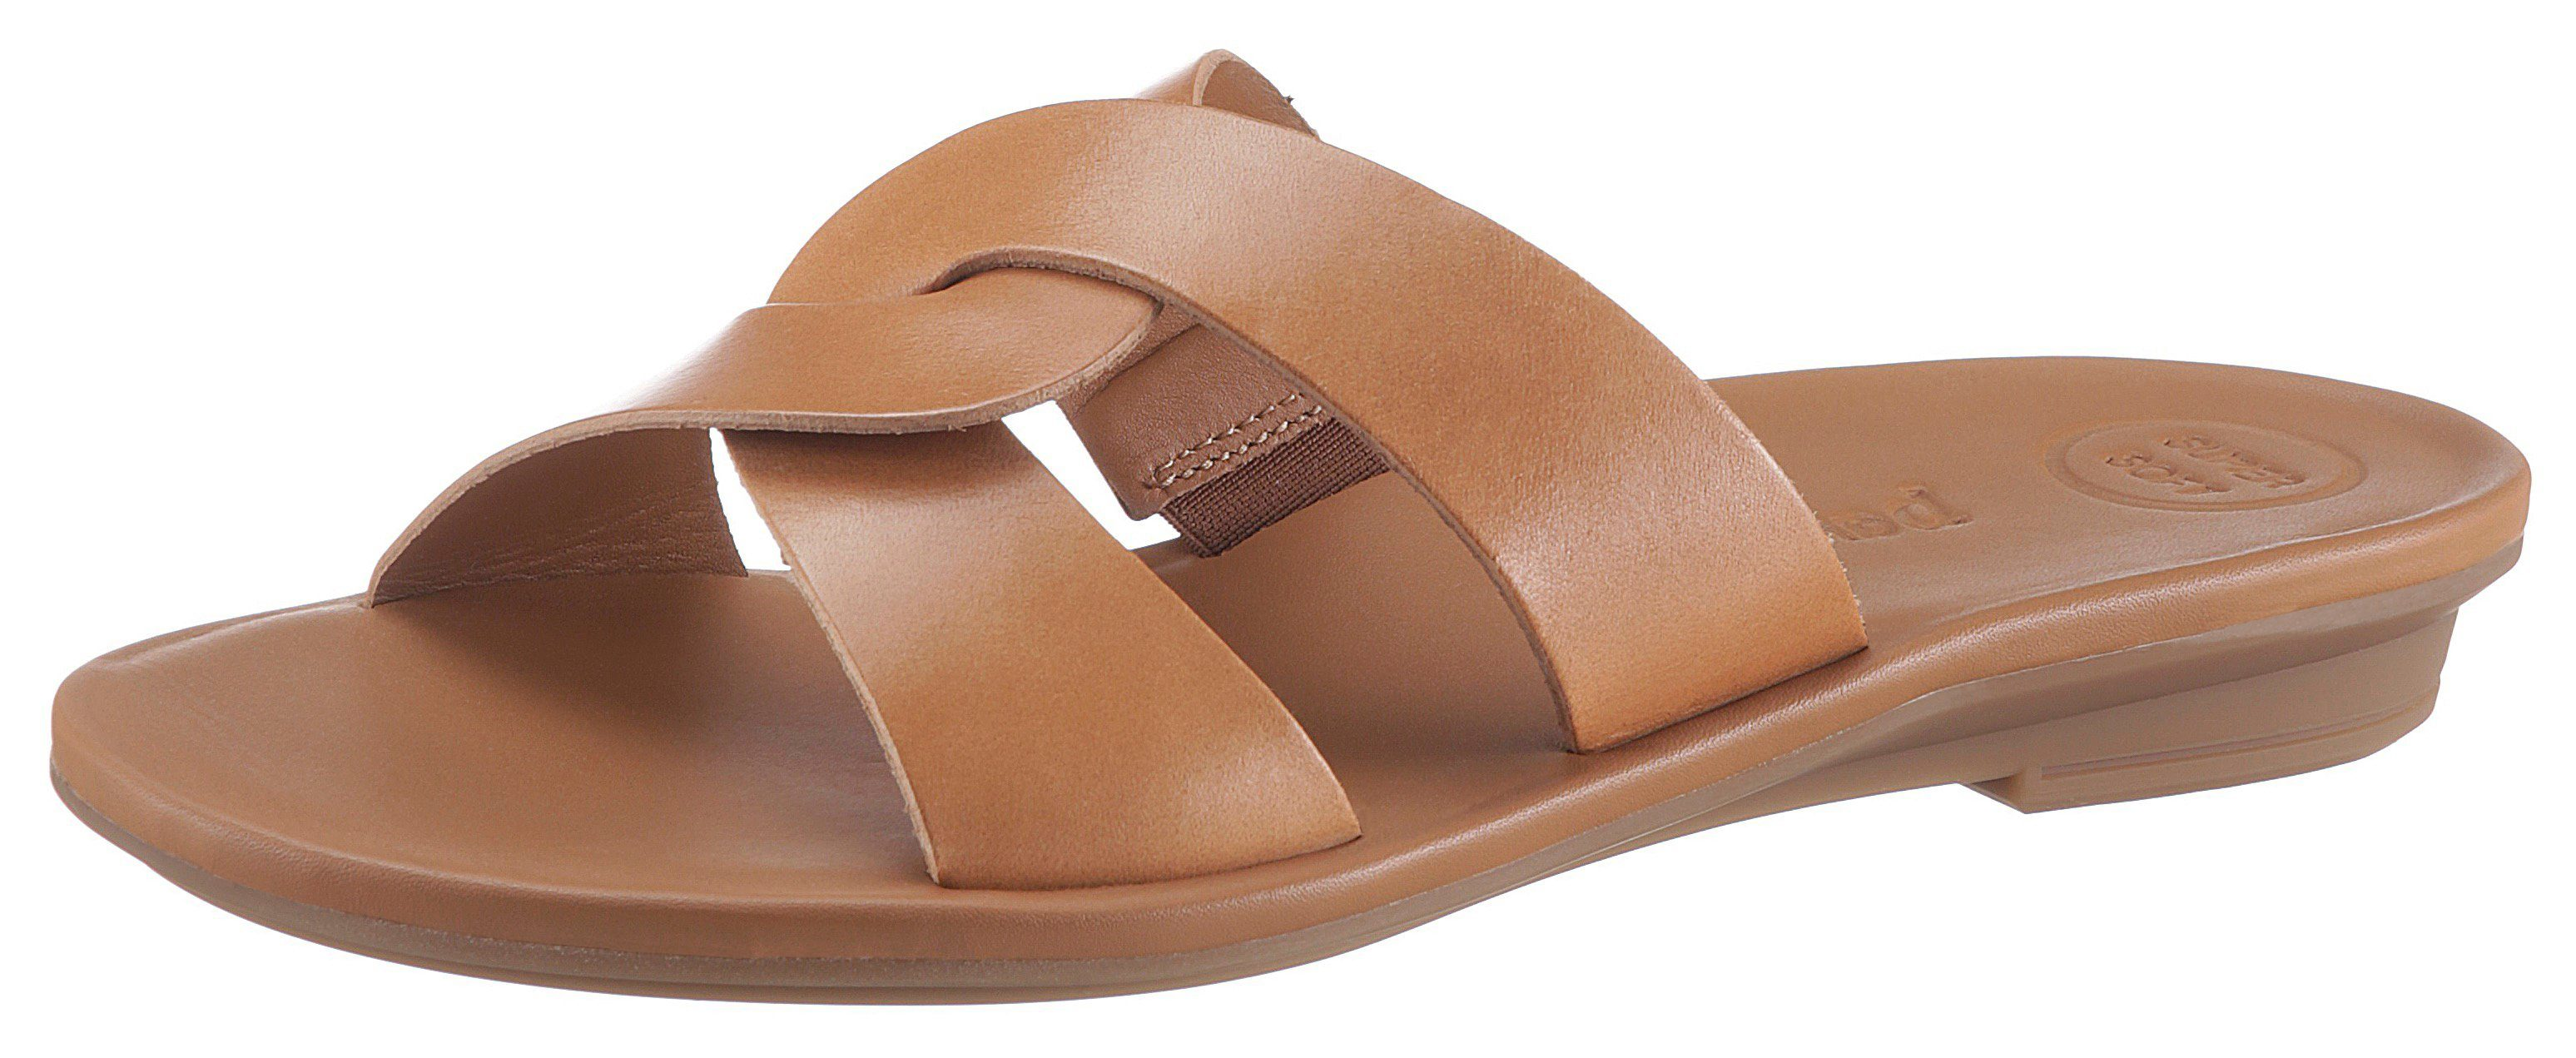 Damen Sandale Sandalette Keilabsatz Wedges Plateau Sommer Freizeit 6596